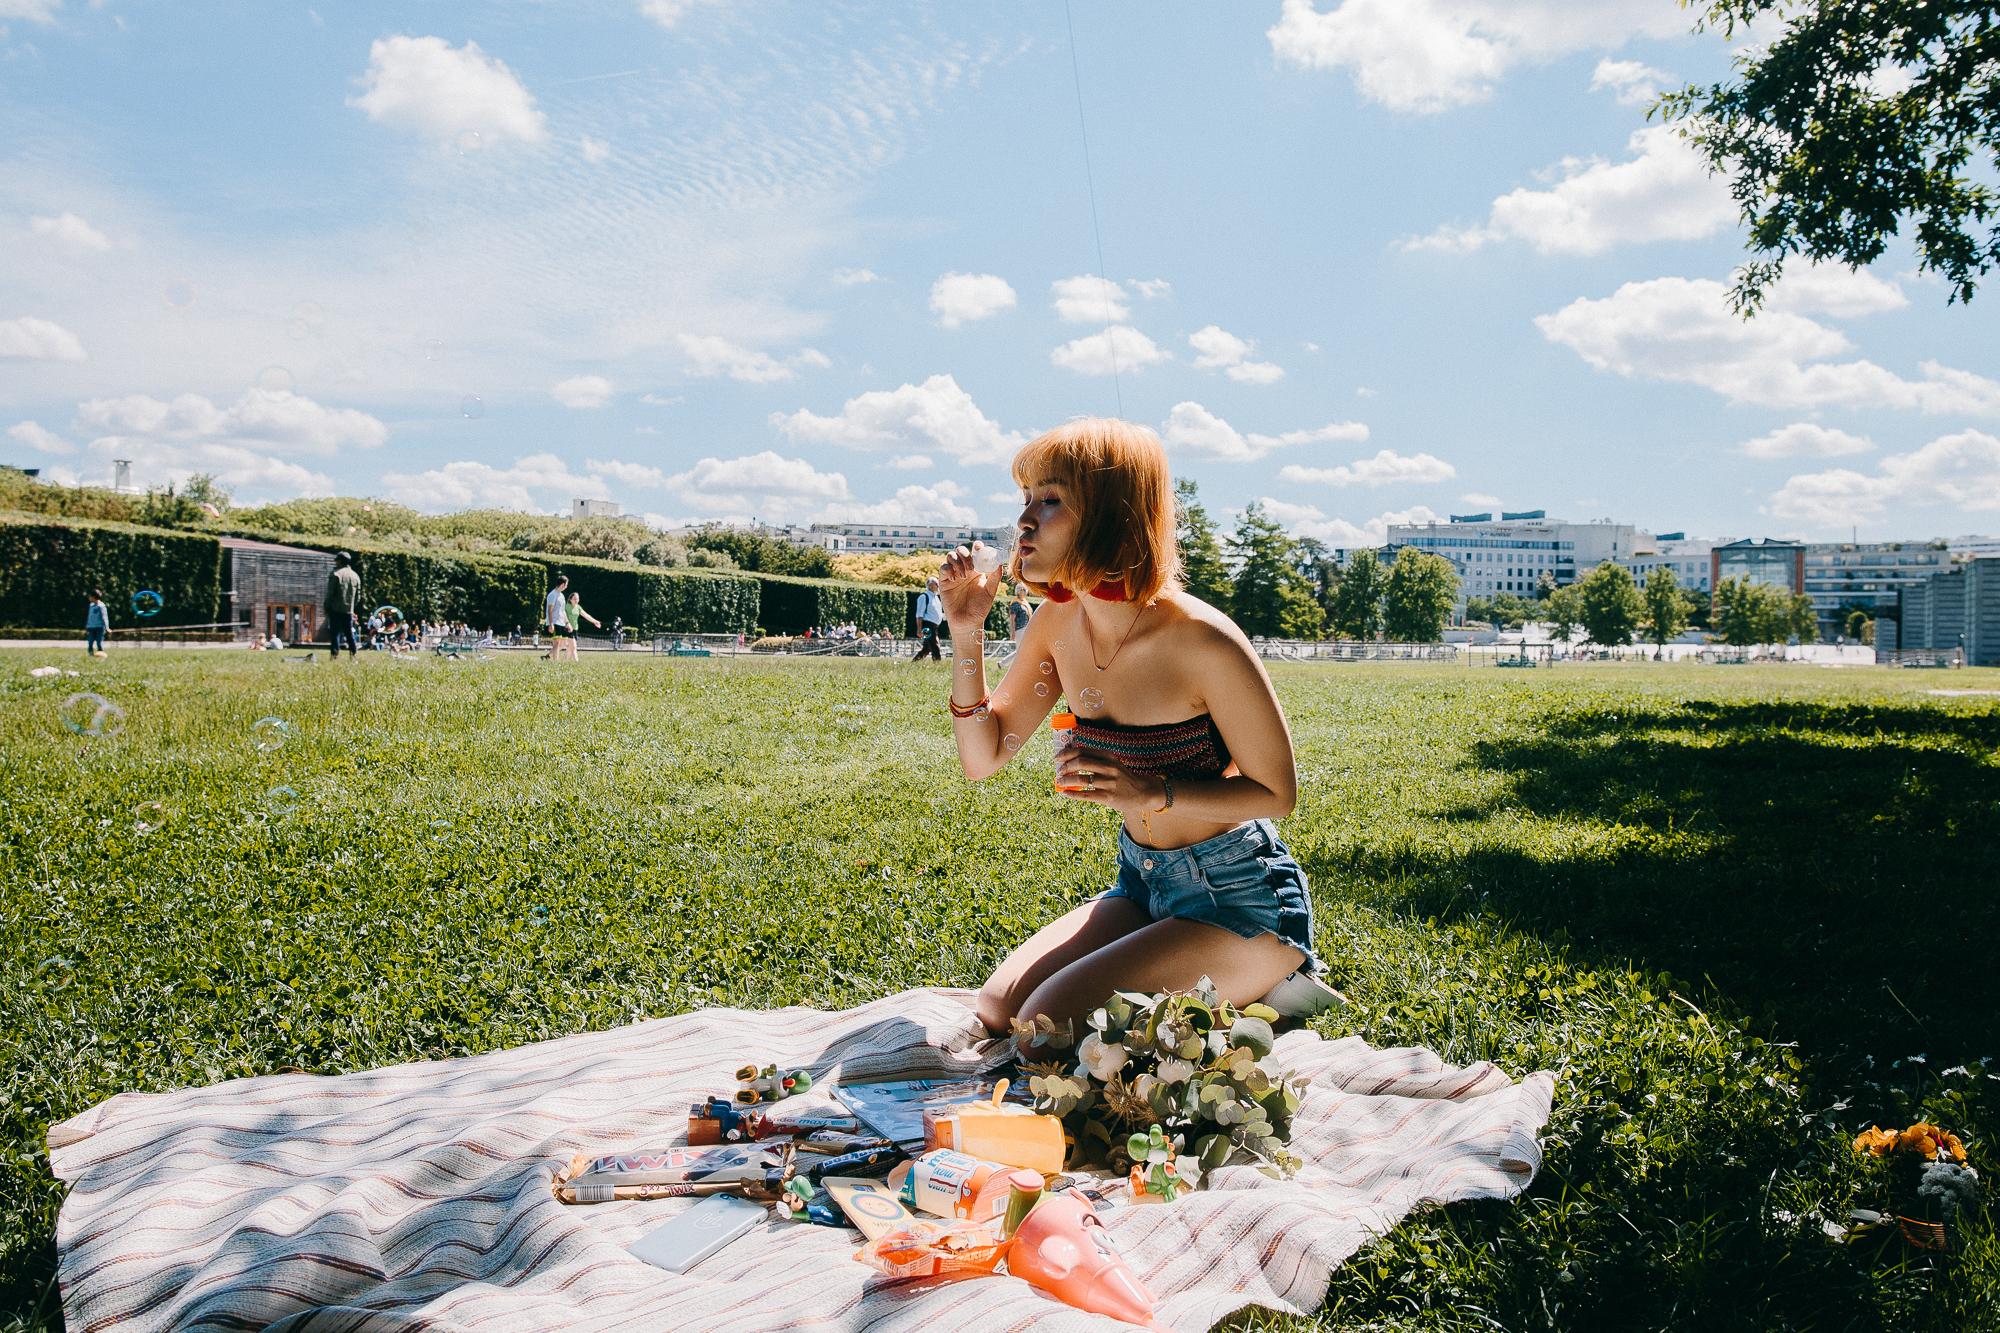 Picnic in Paris blogger park linhbaybong